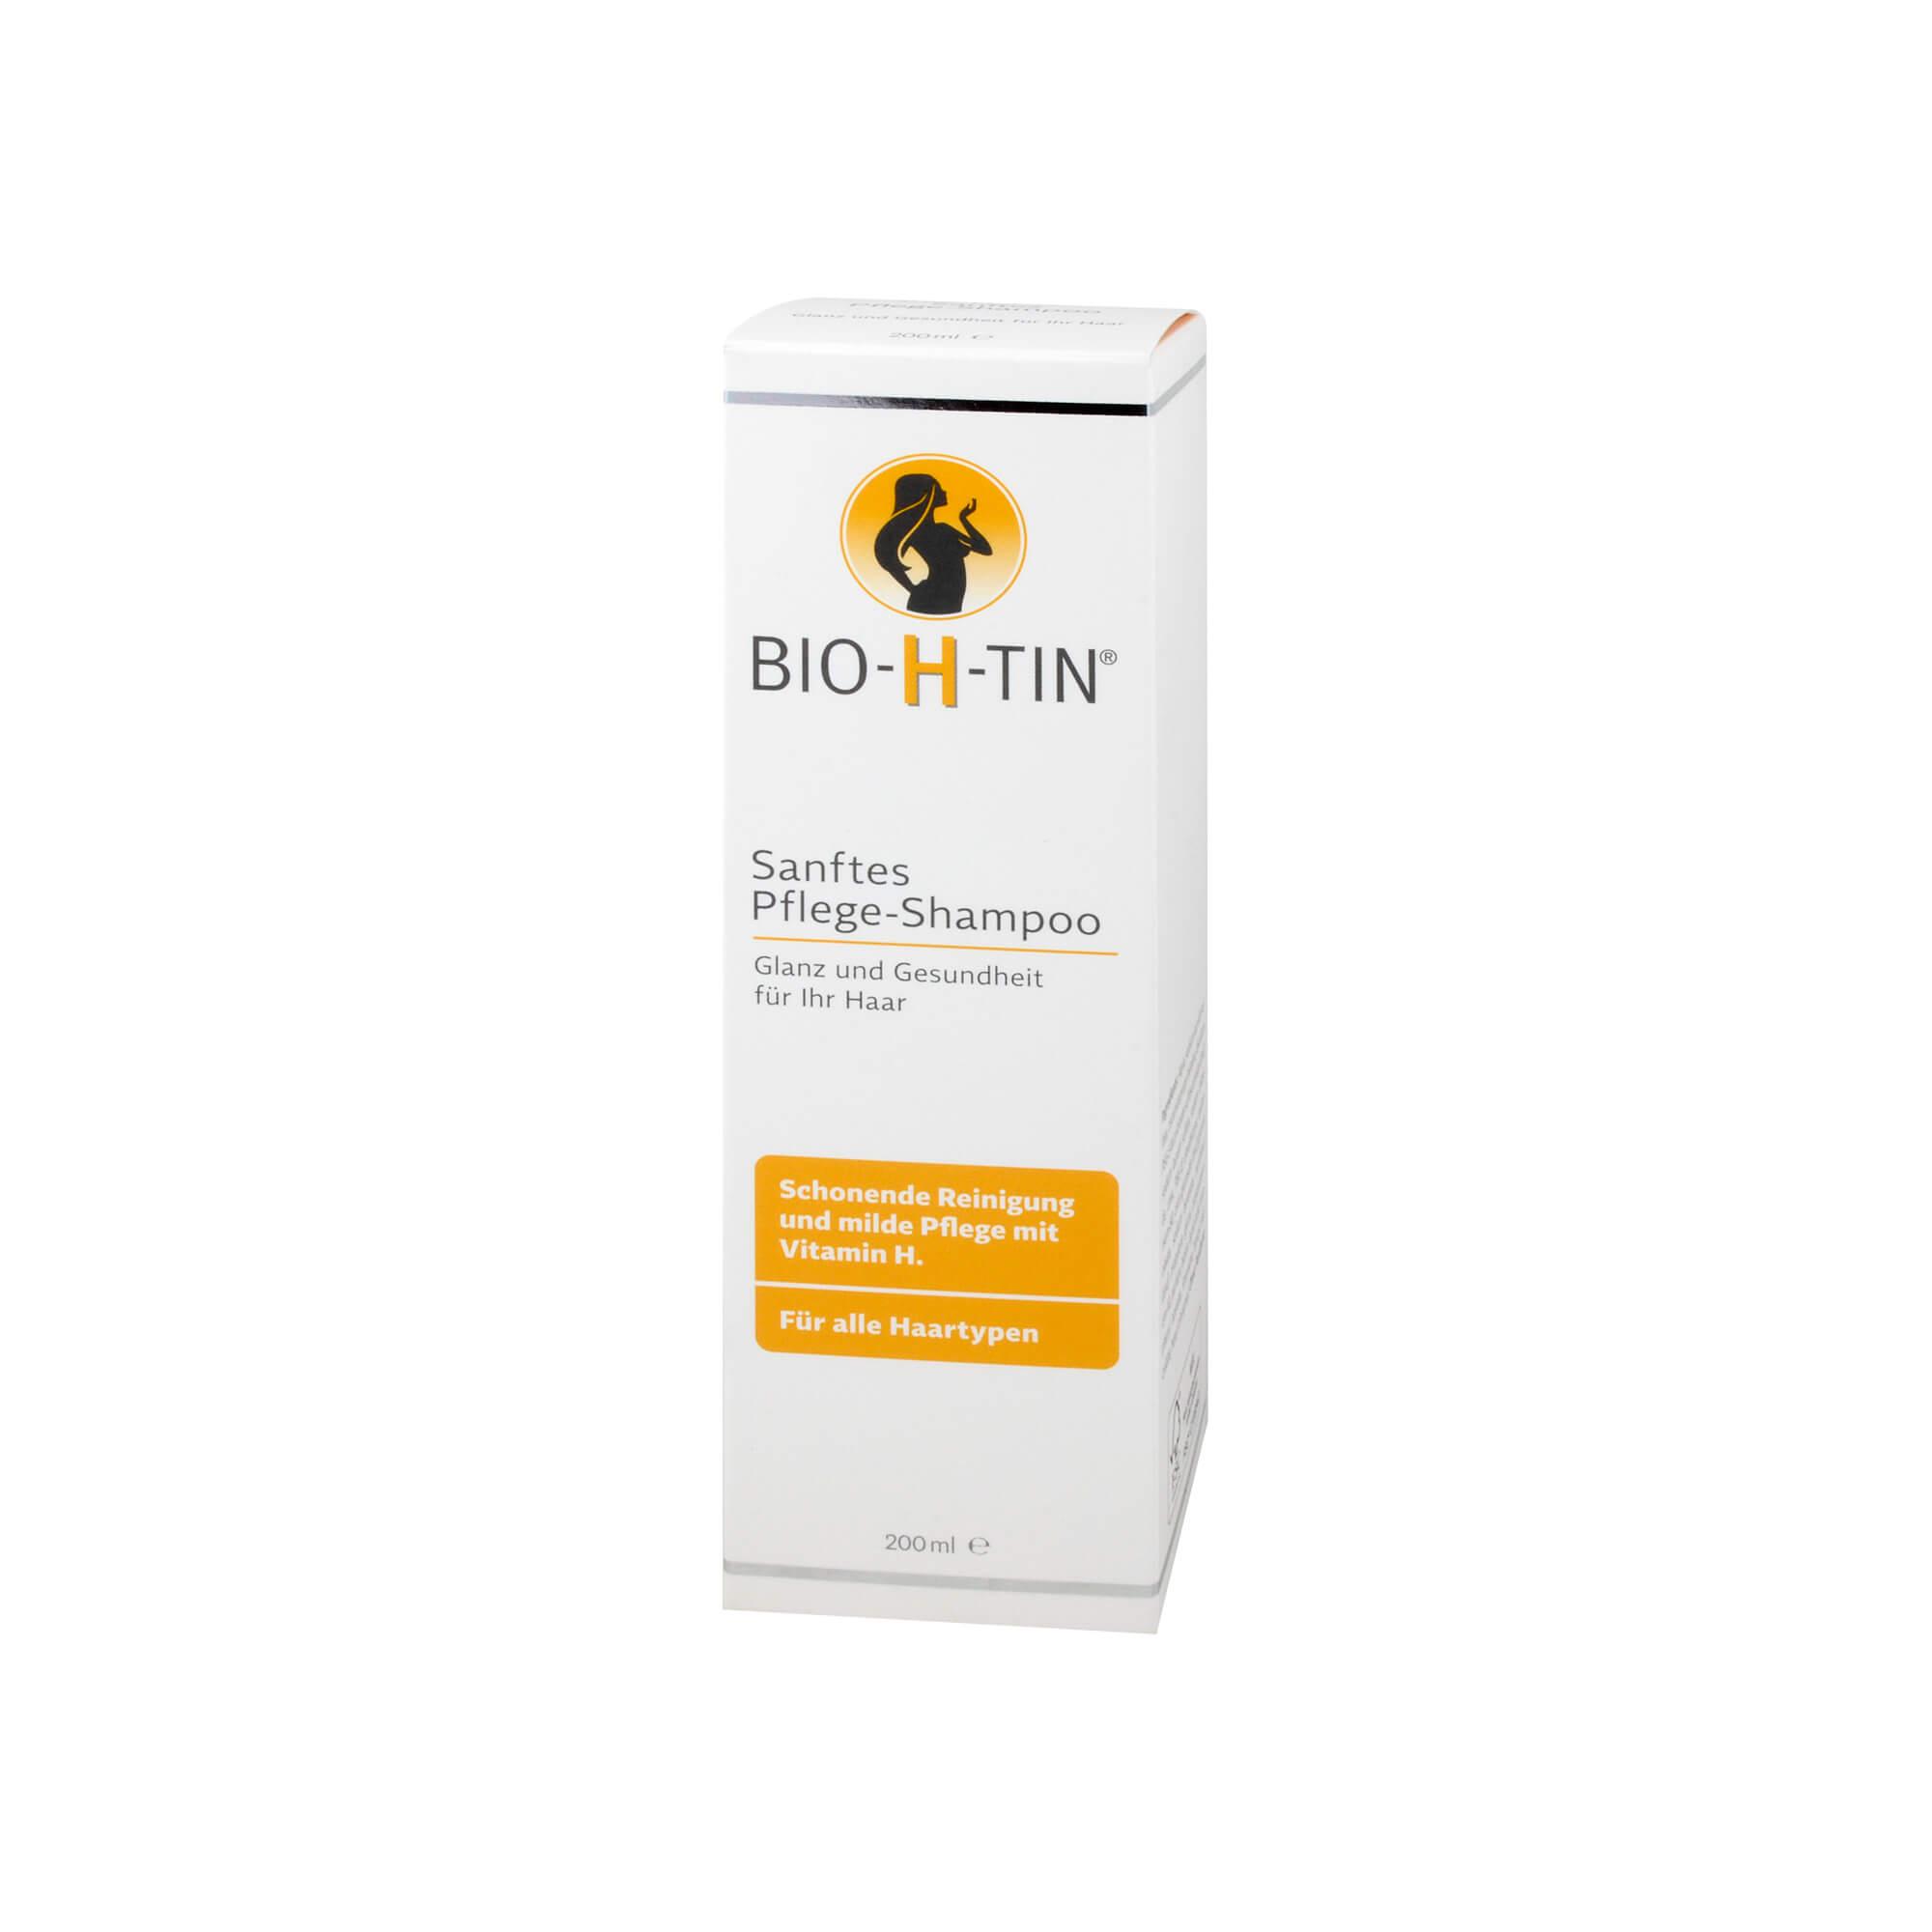 BIO-H-TIN Pflege Shampoo